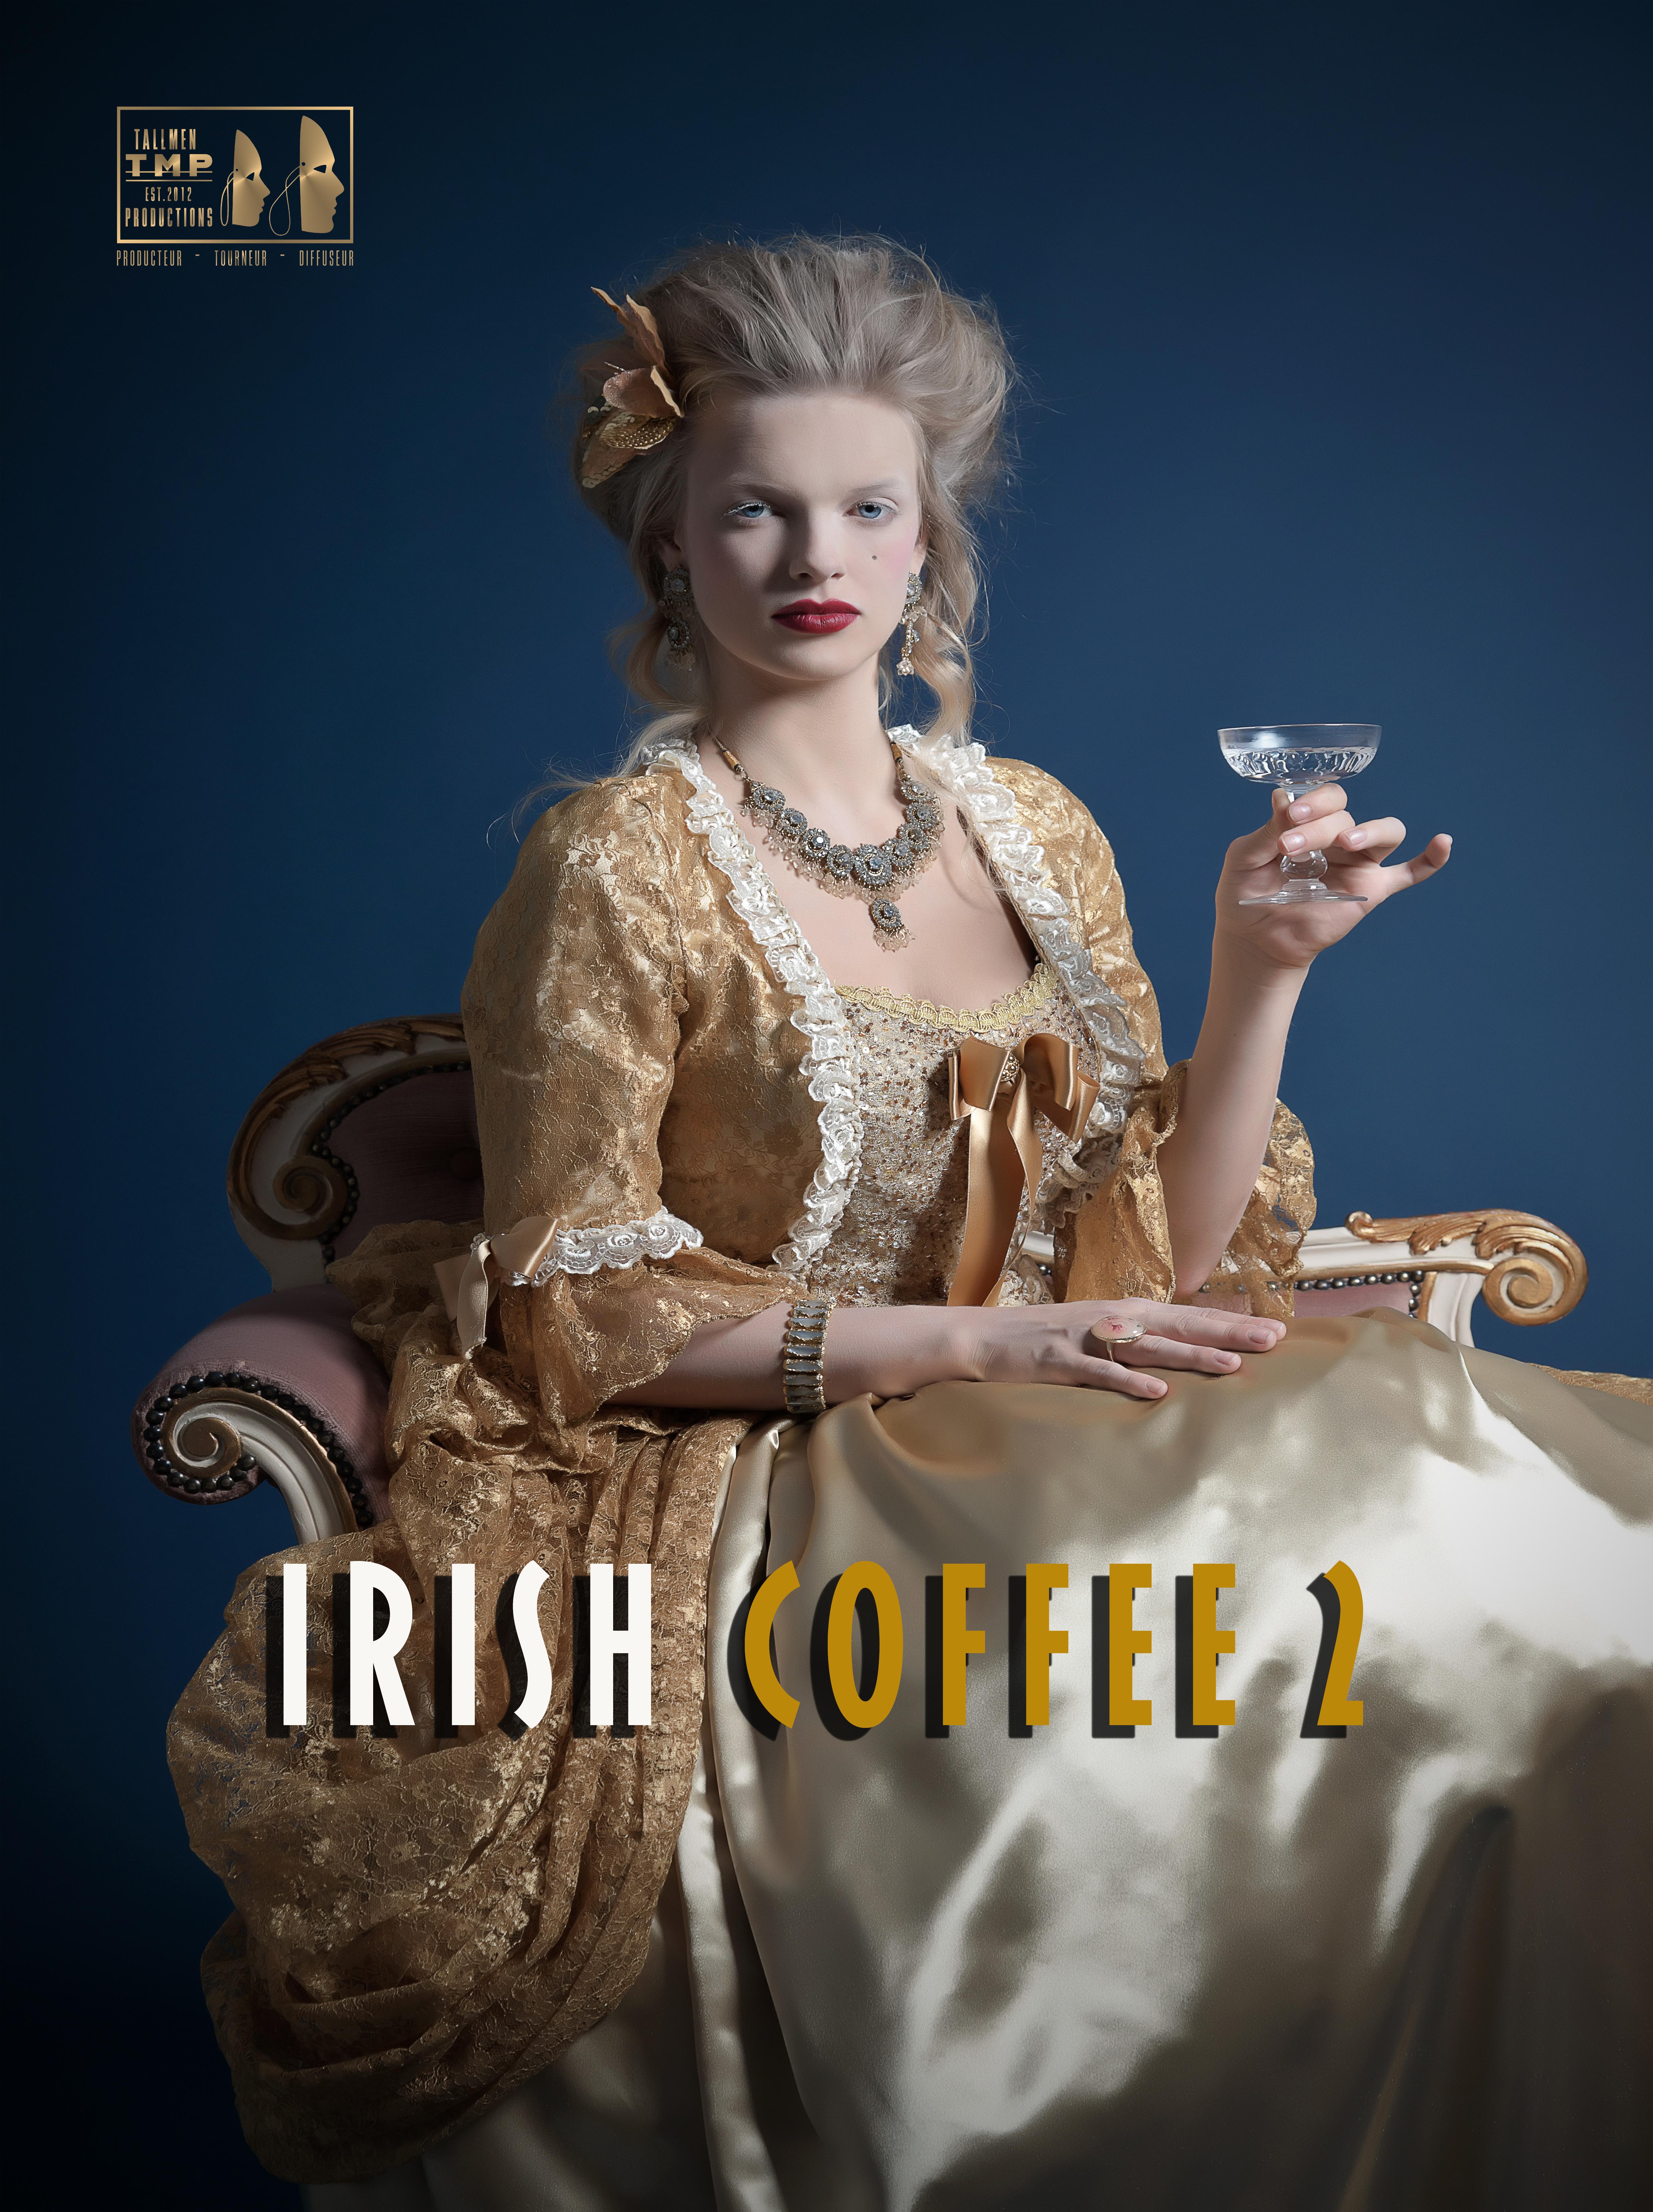 IRIS COFFEE 2